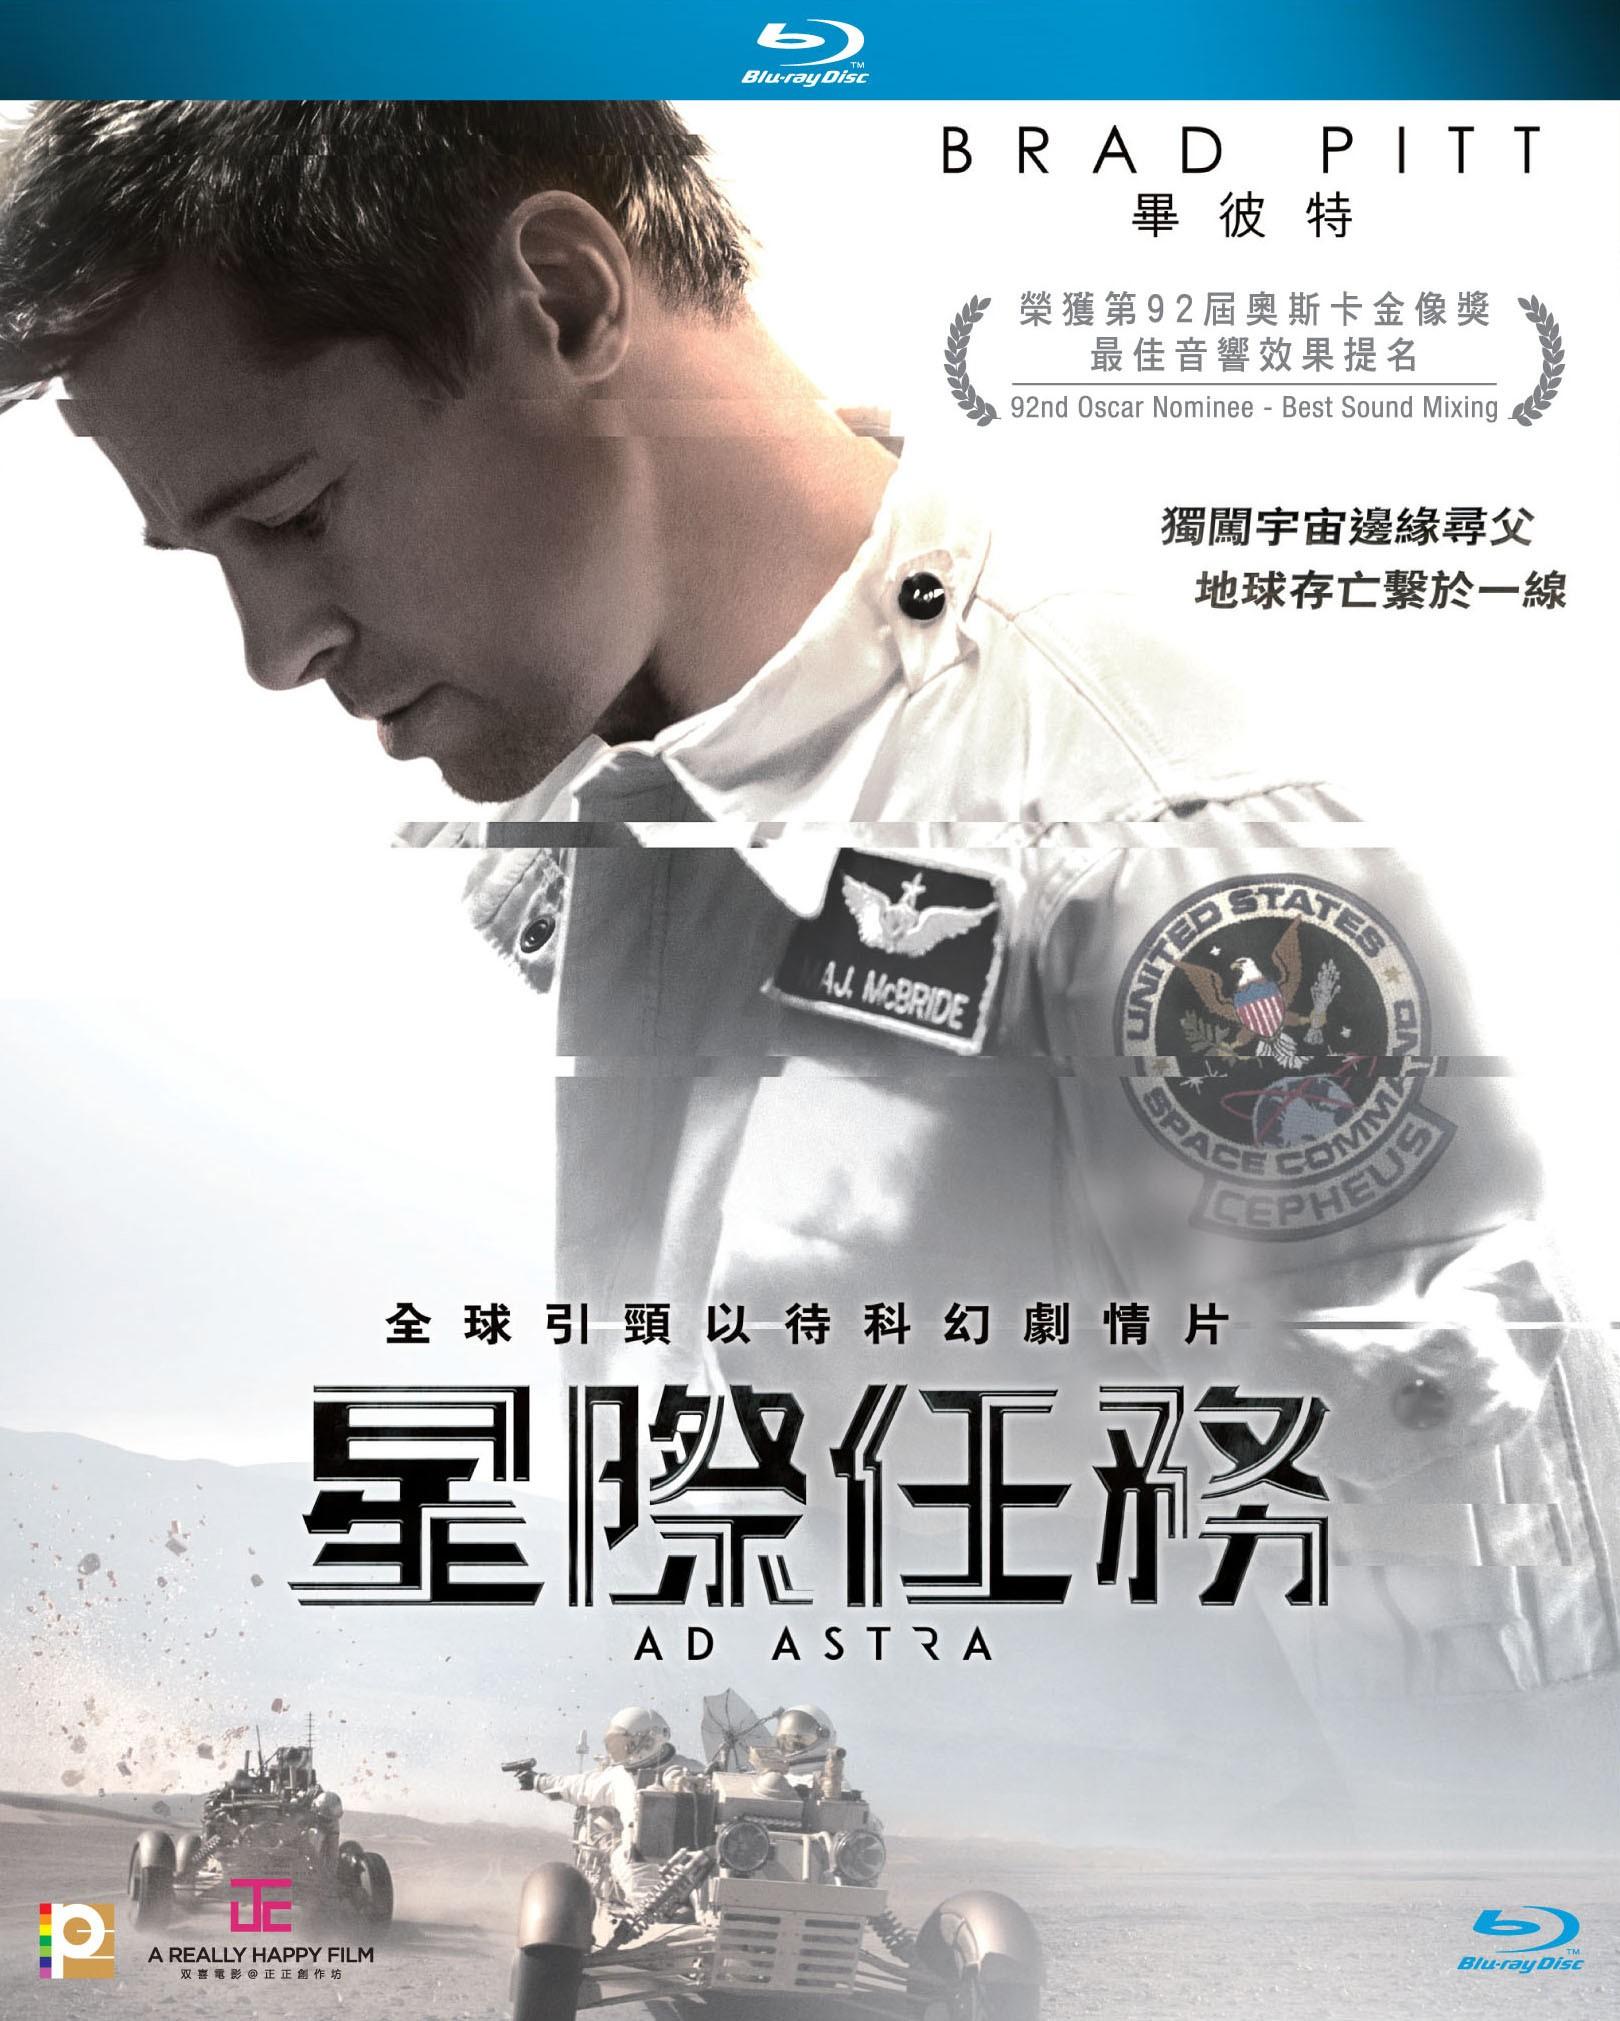 https://shop.panorama.com.hk/hk/sci-fi/3363--2020-04-09.html